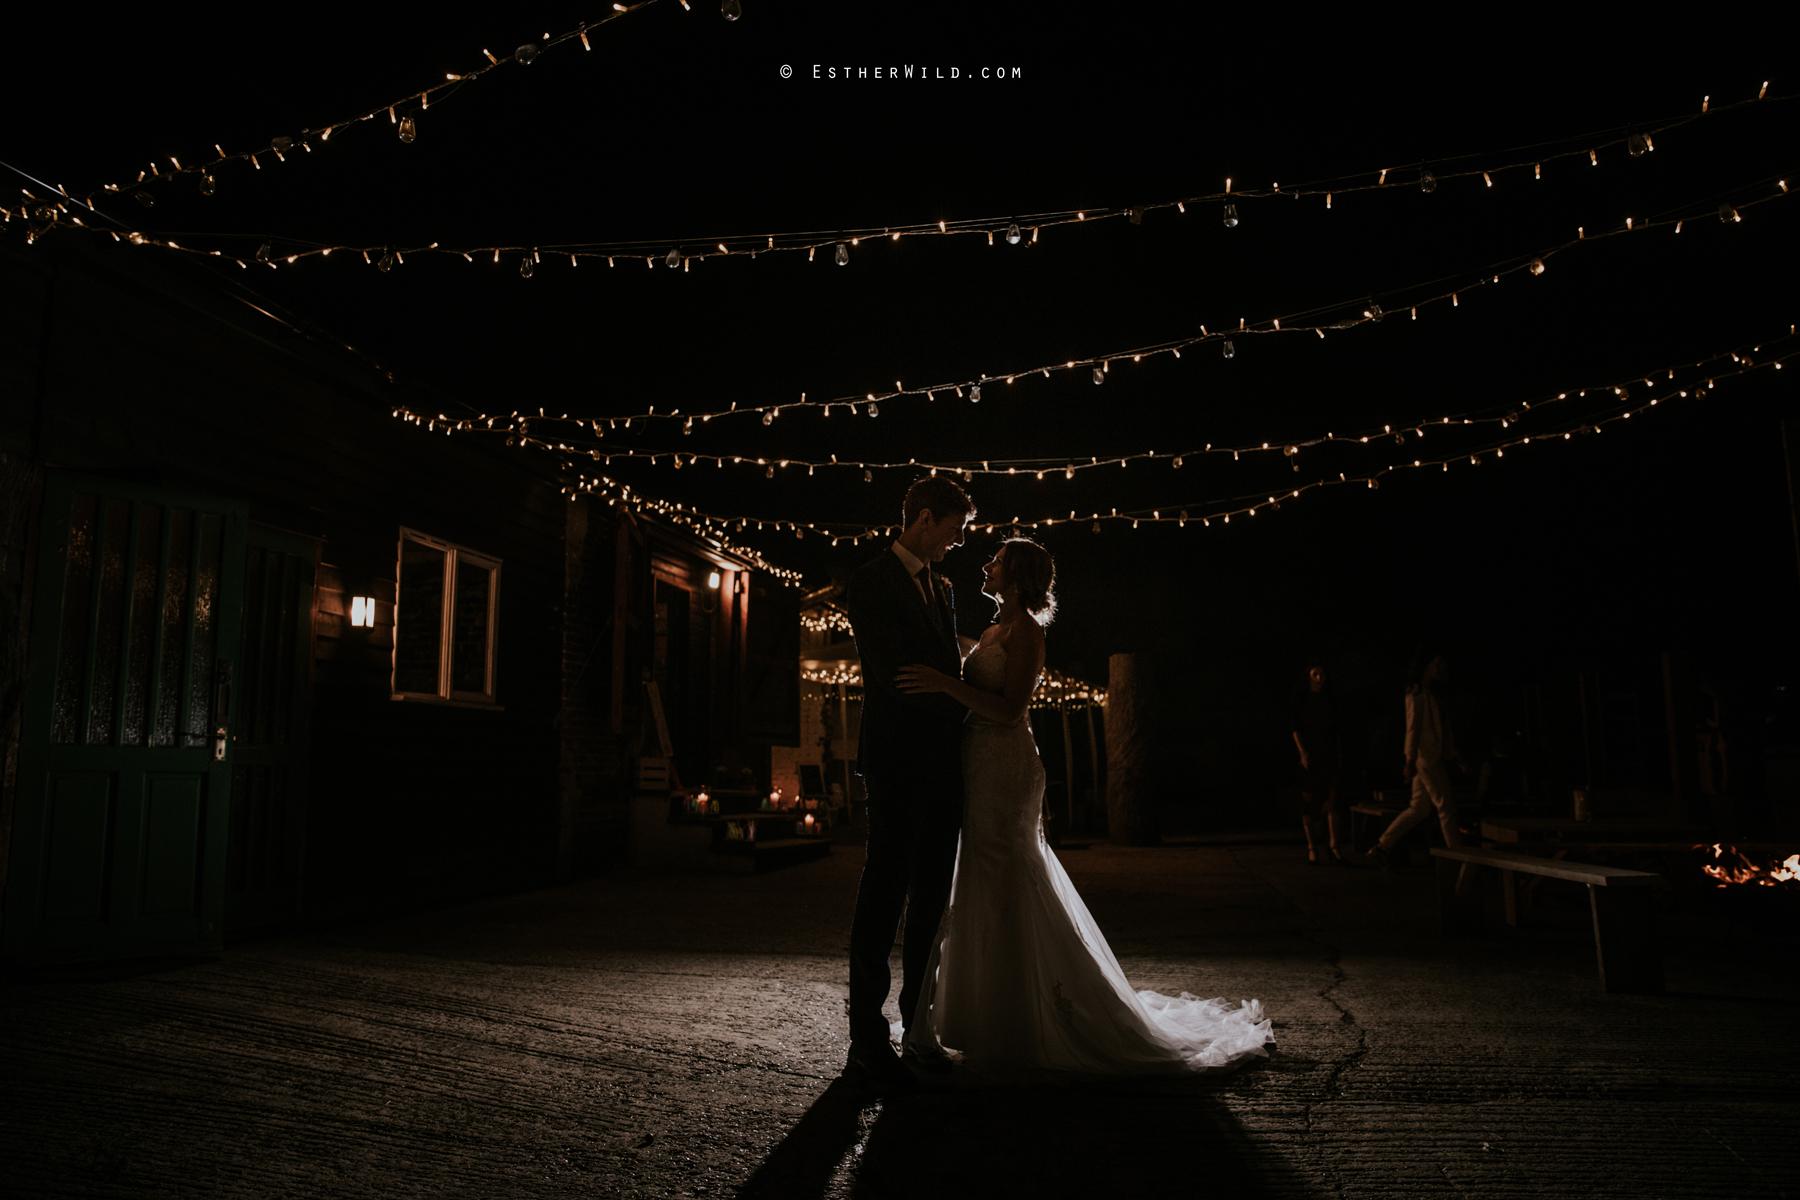 Glebe_Farm_Barn_Rustic_Norfolk_Wedding_Esther_Wild_Photographer_Copyright_IMG_3265.jpg